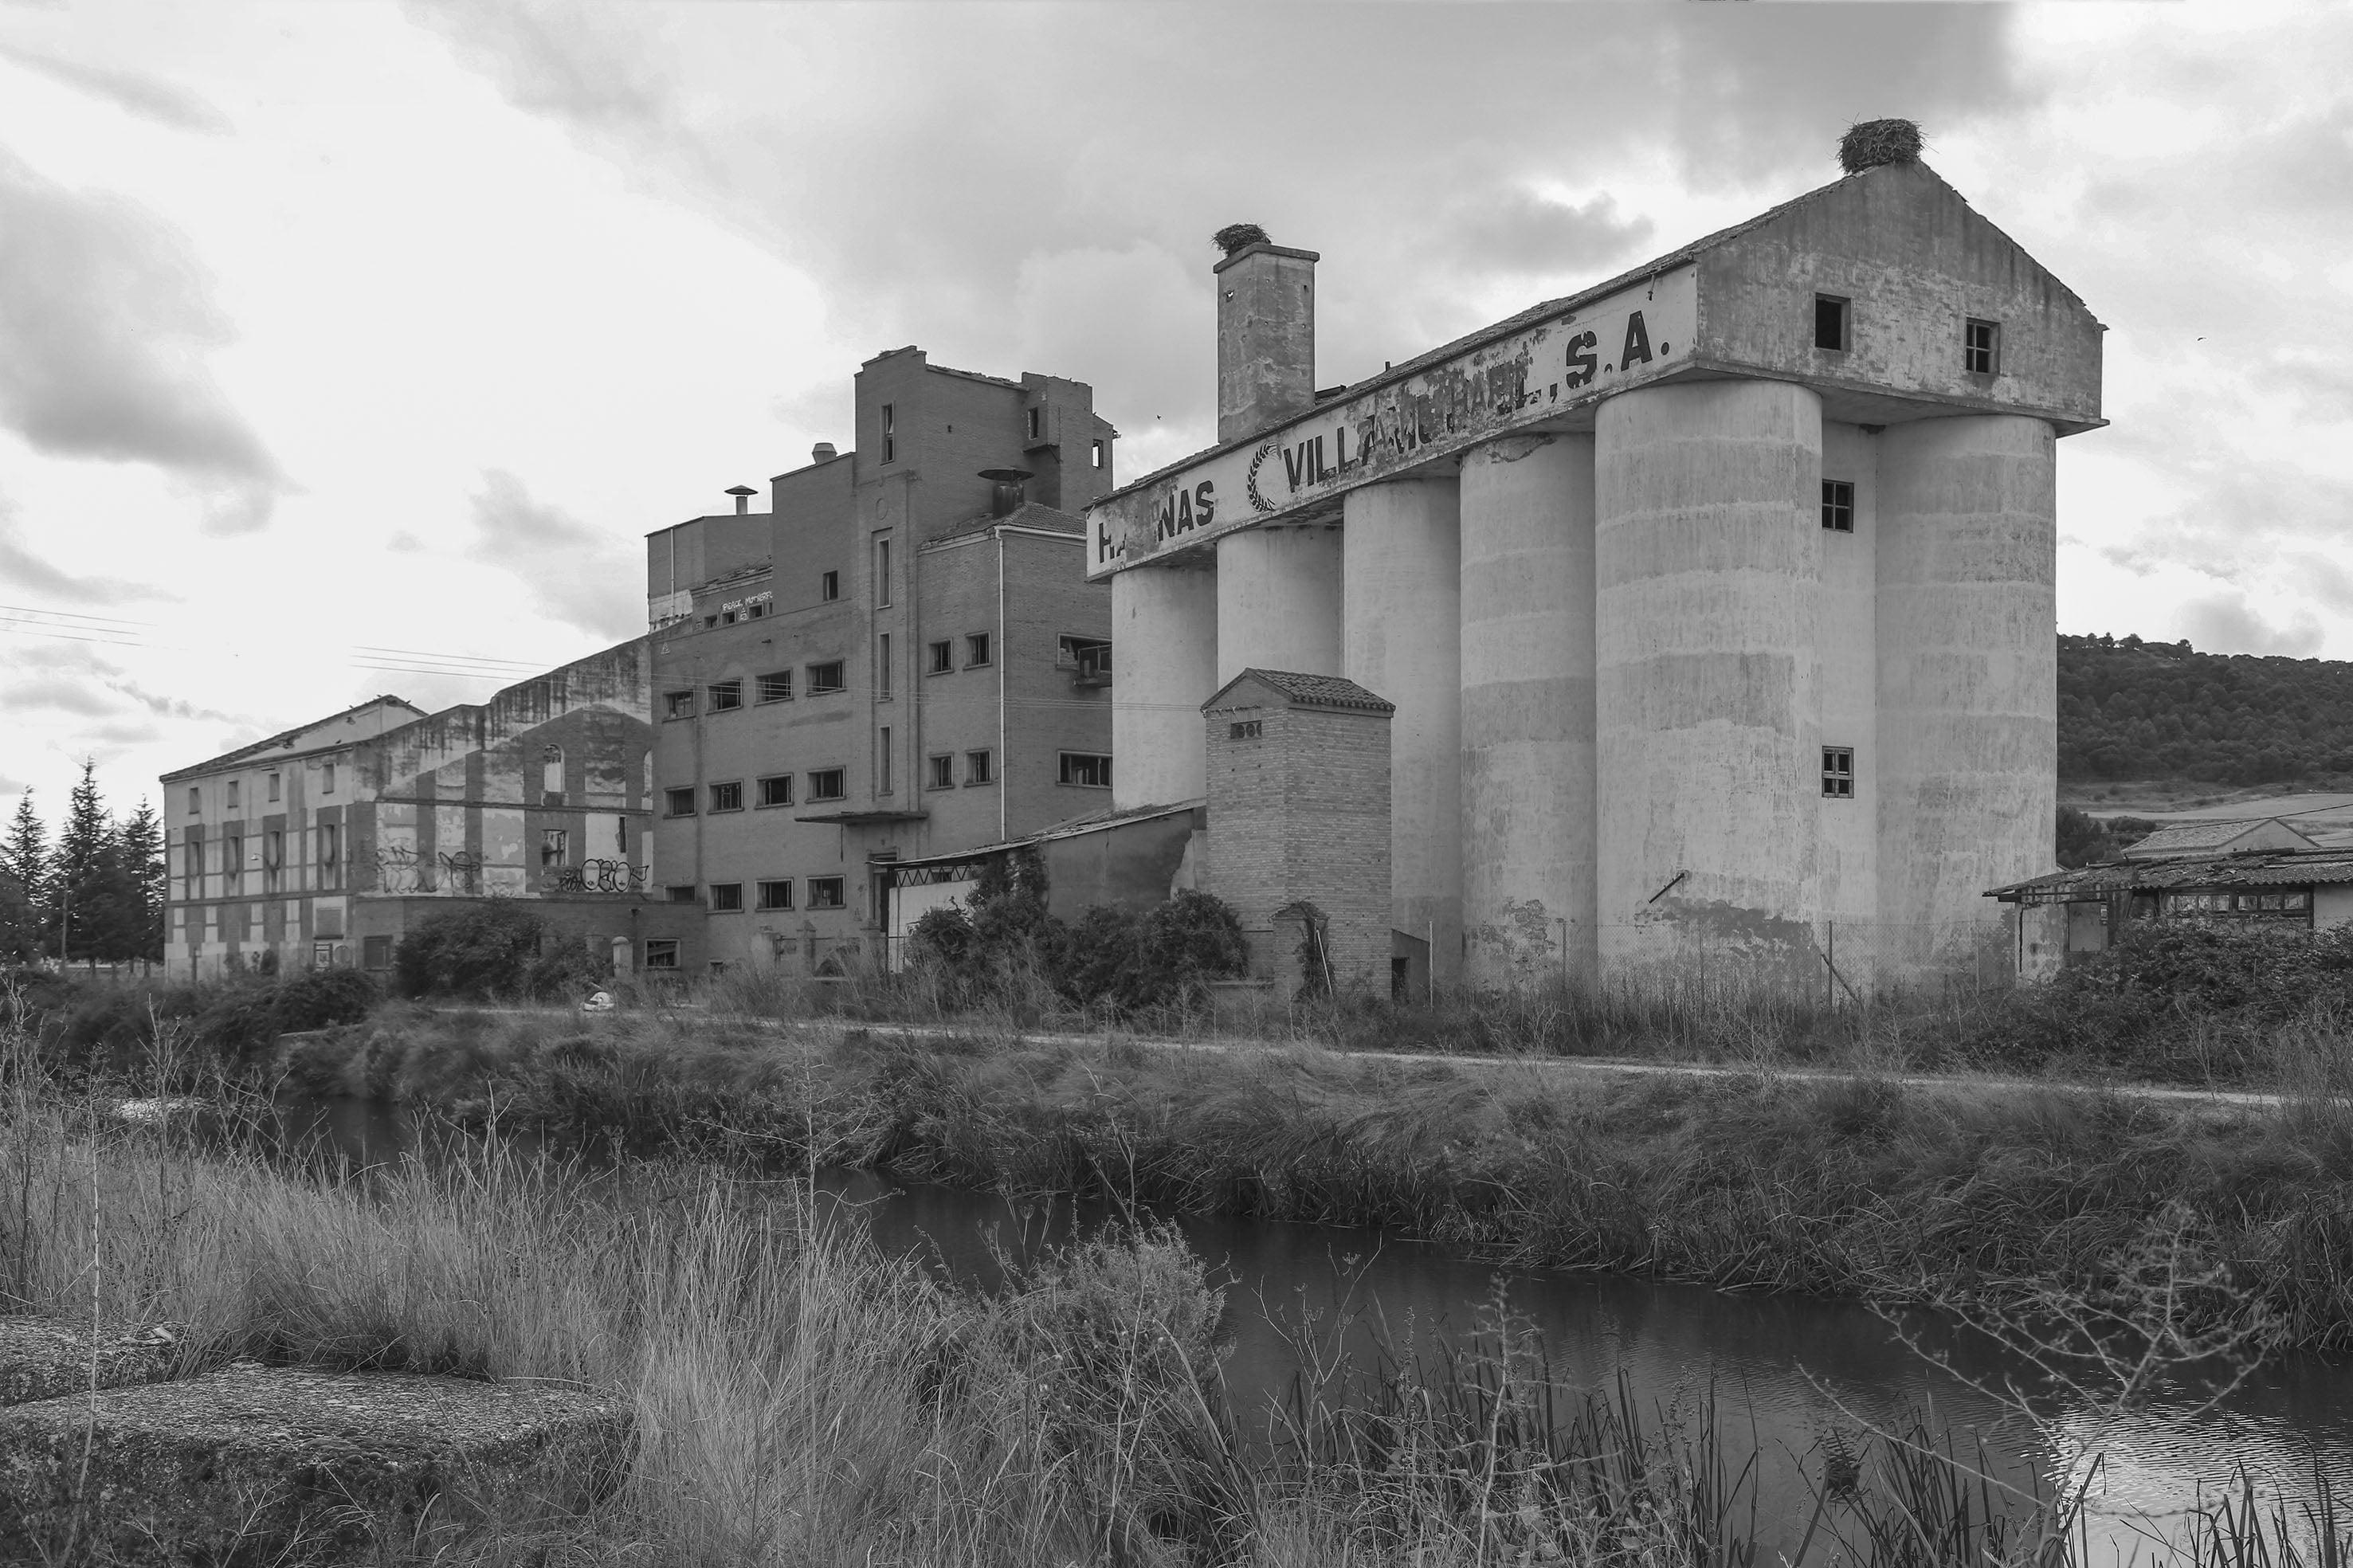 """Il Paesaggio Industriale del Canal de Castilla"" - Nicola Cavallera"